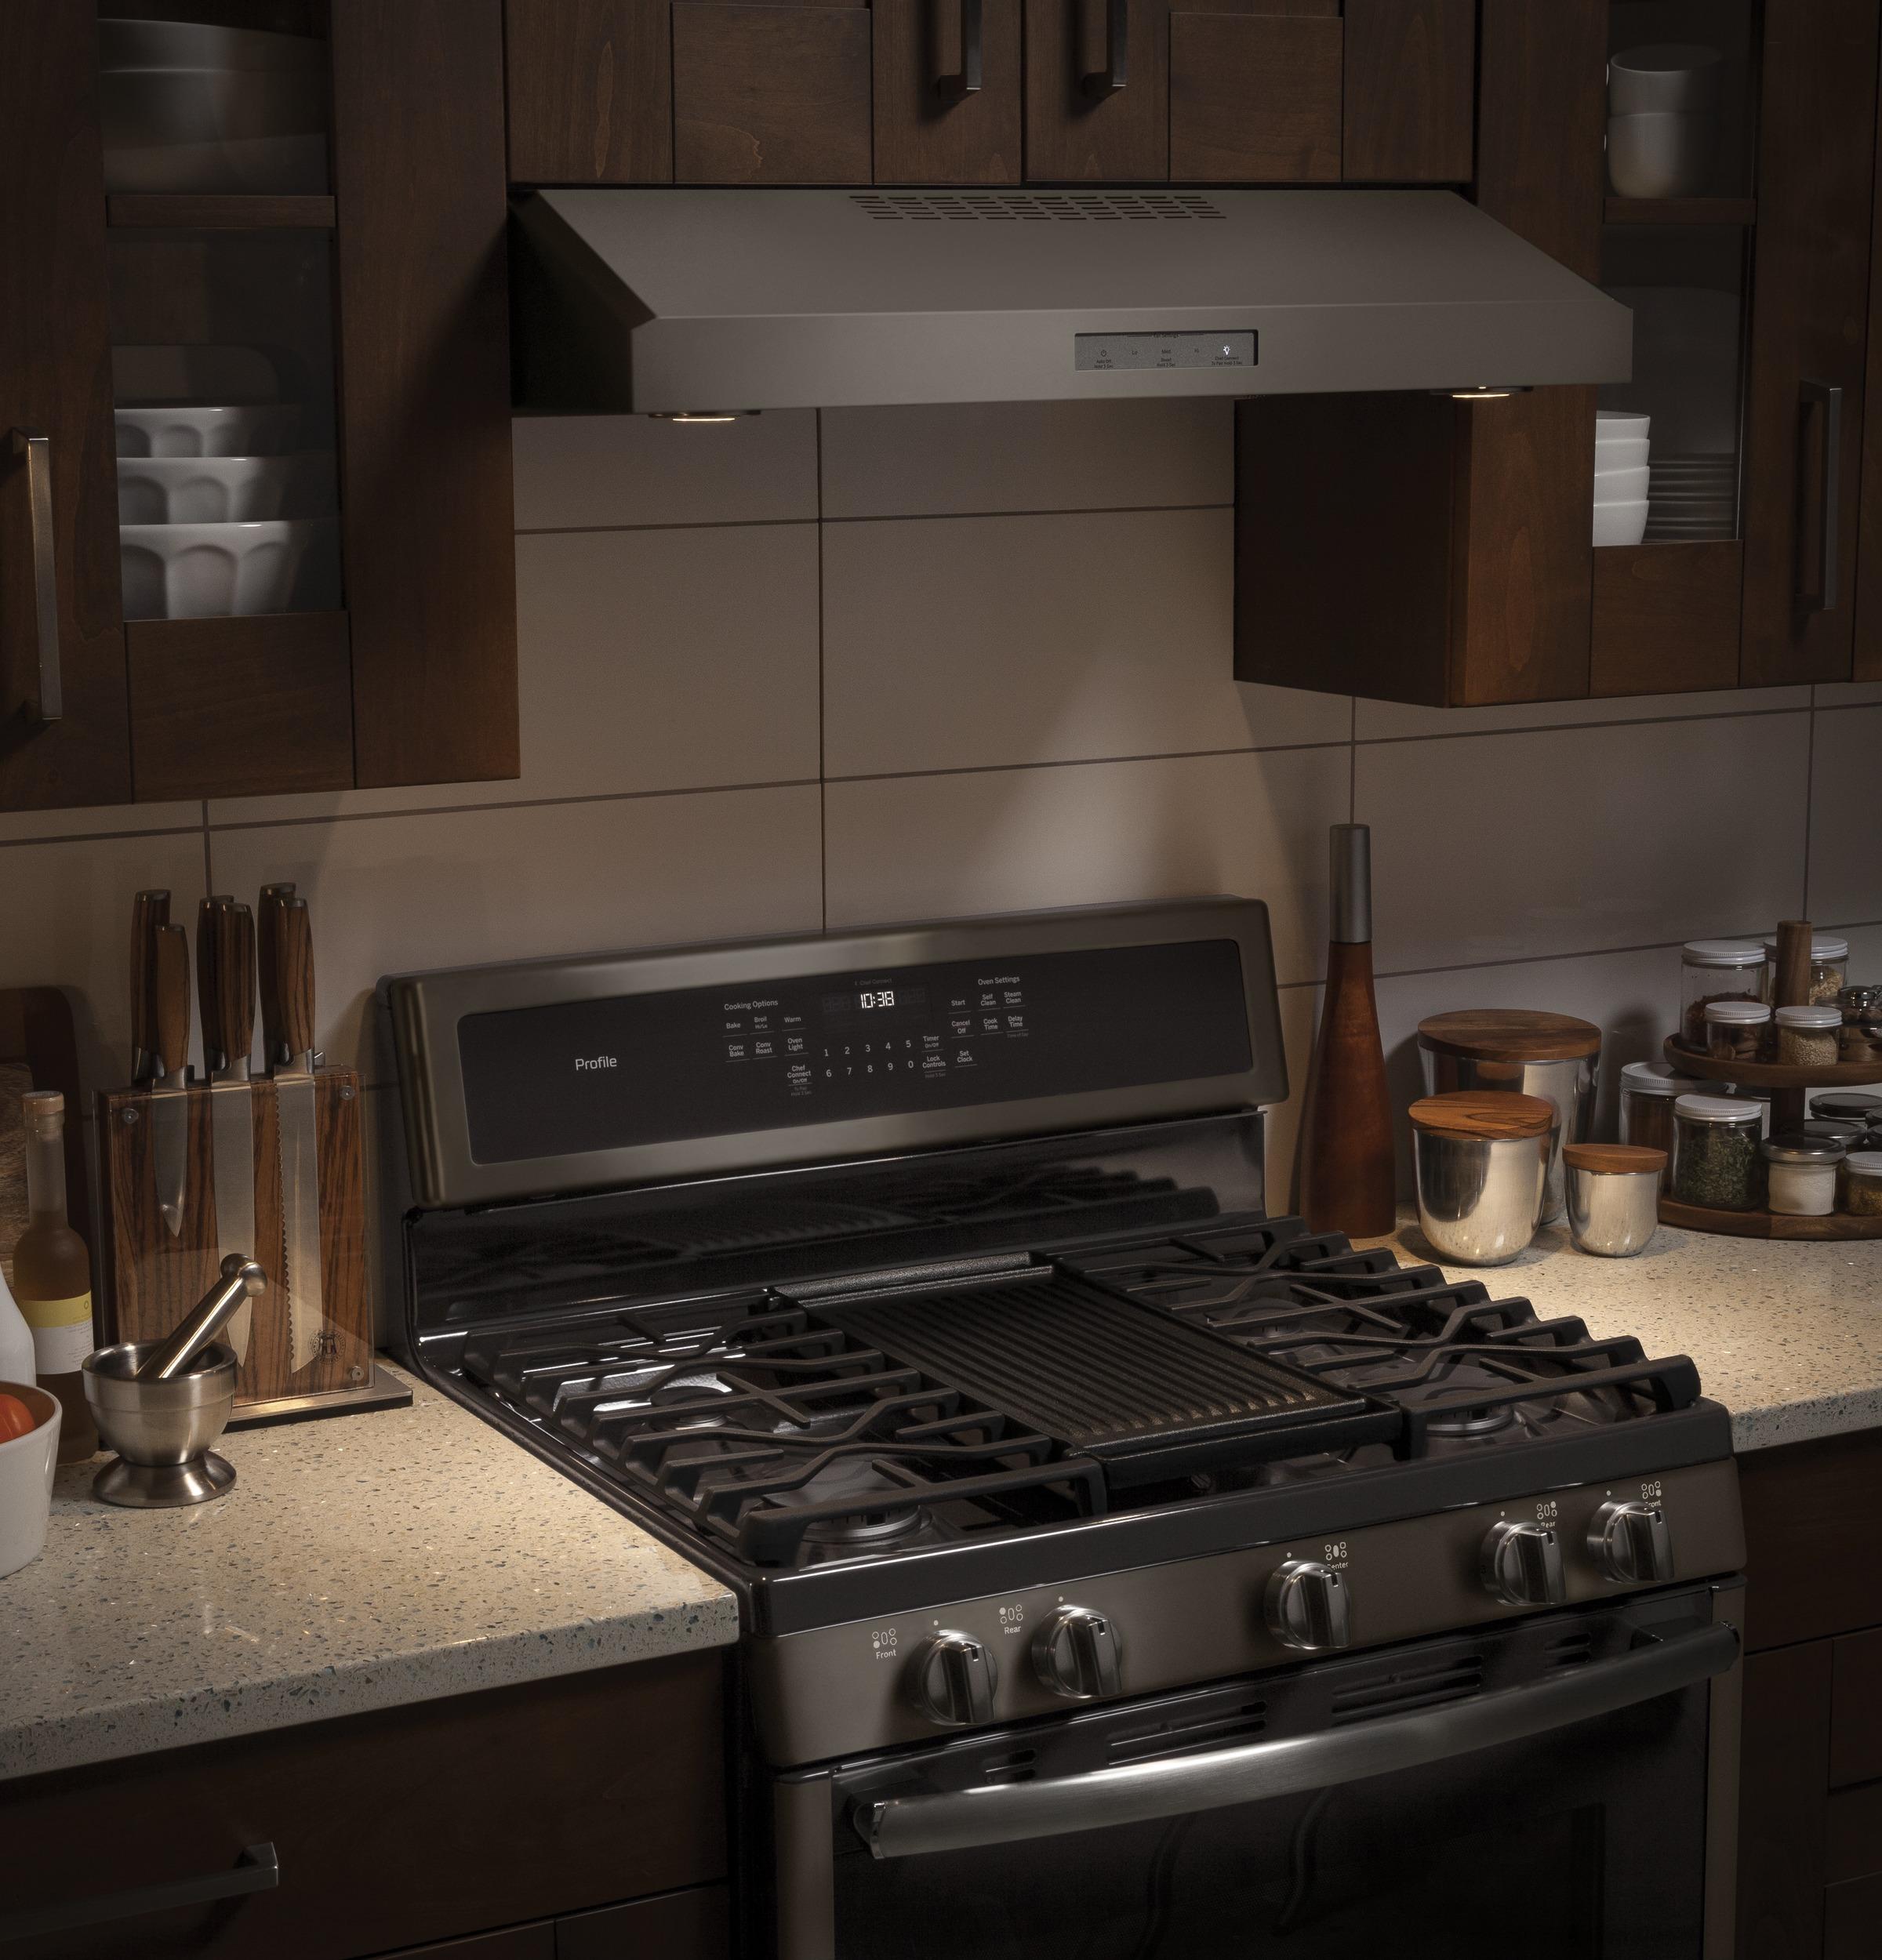 Model: PVX7300EJES | GE Profile™ Series 30